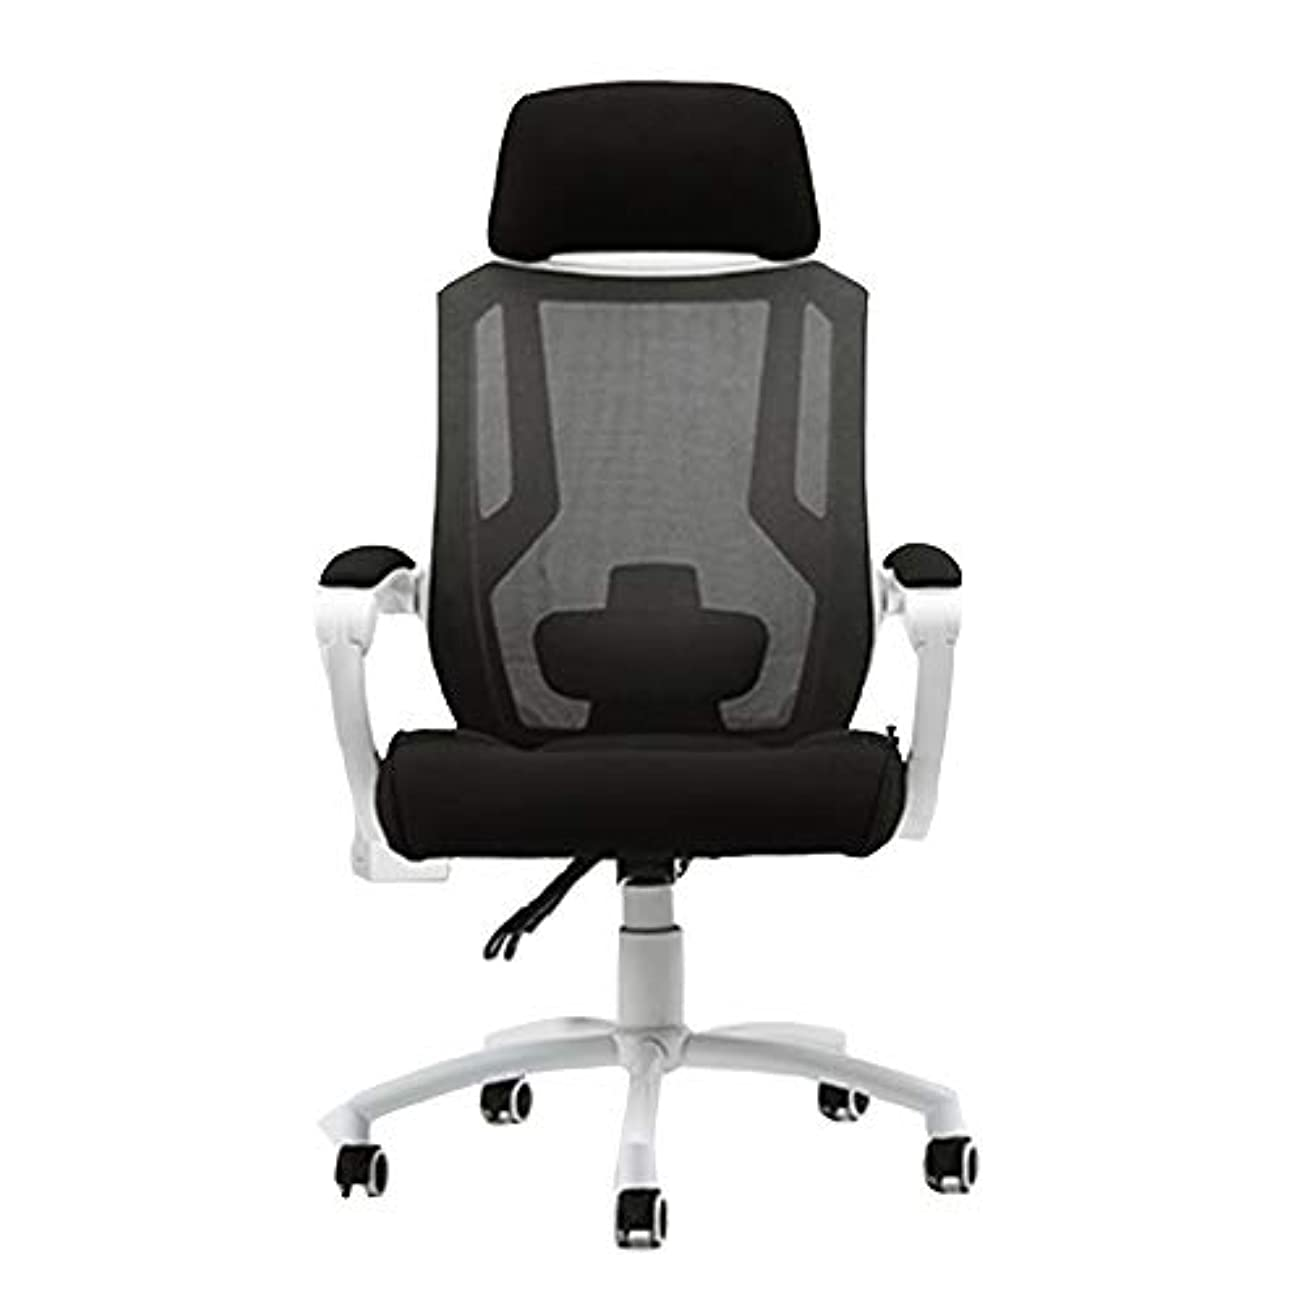 LJHA 回転椅子、160°はオフィスチェアを下に横たえることができます家庭用ロータリー手すり回転椅子 レジャーチェア (Color : White - no foot support)